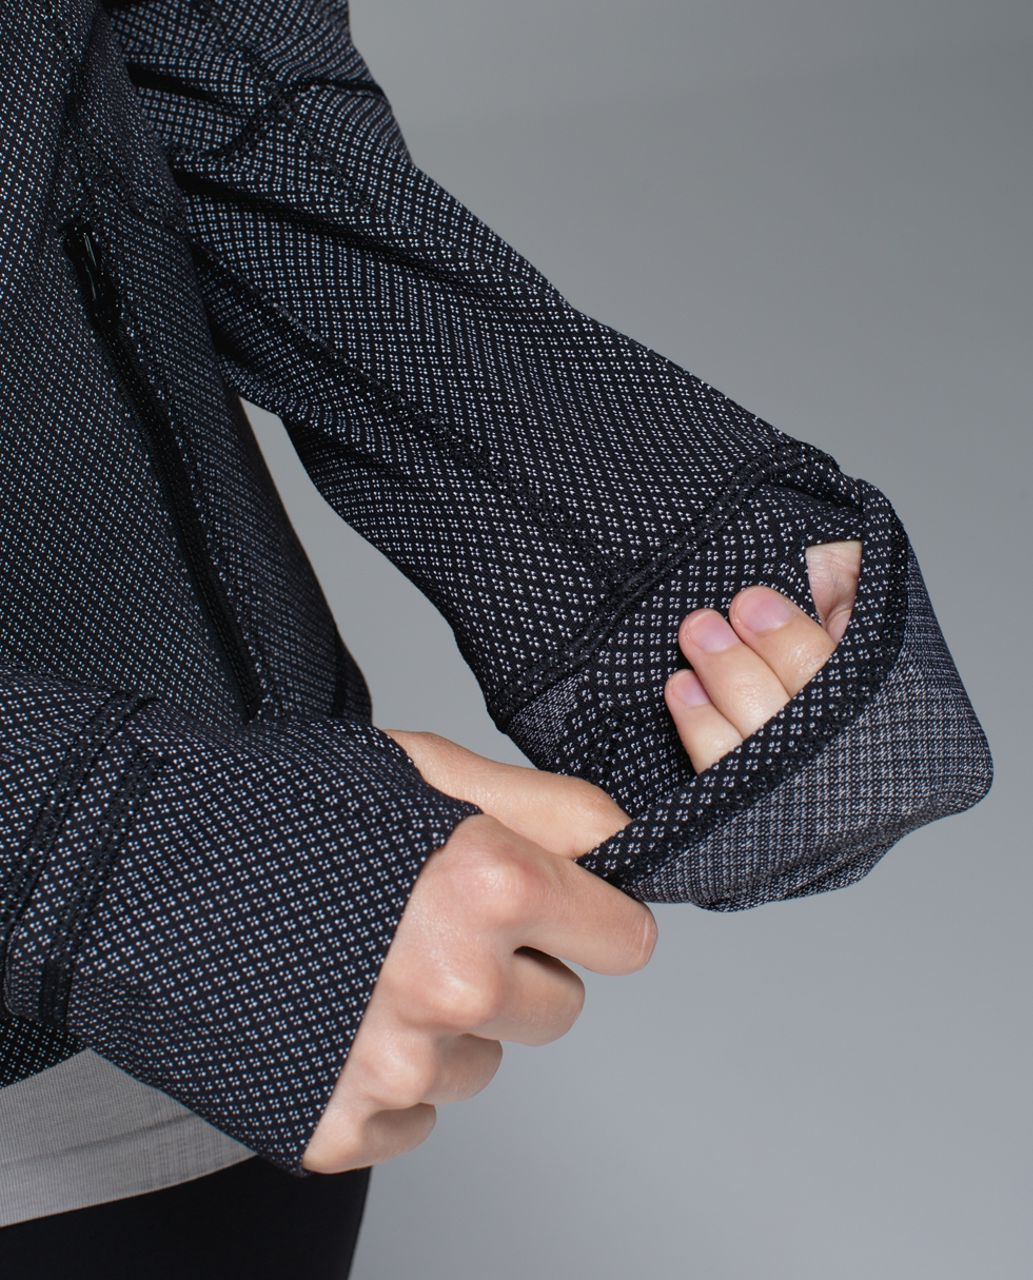 Lululemon Forme Jacket II *Textured - Diamond Dot Black White